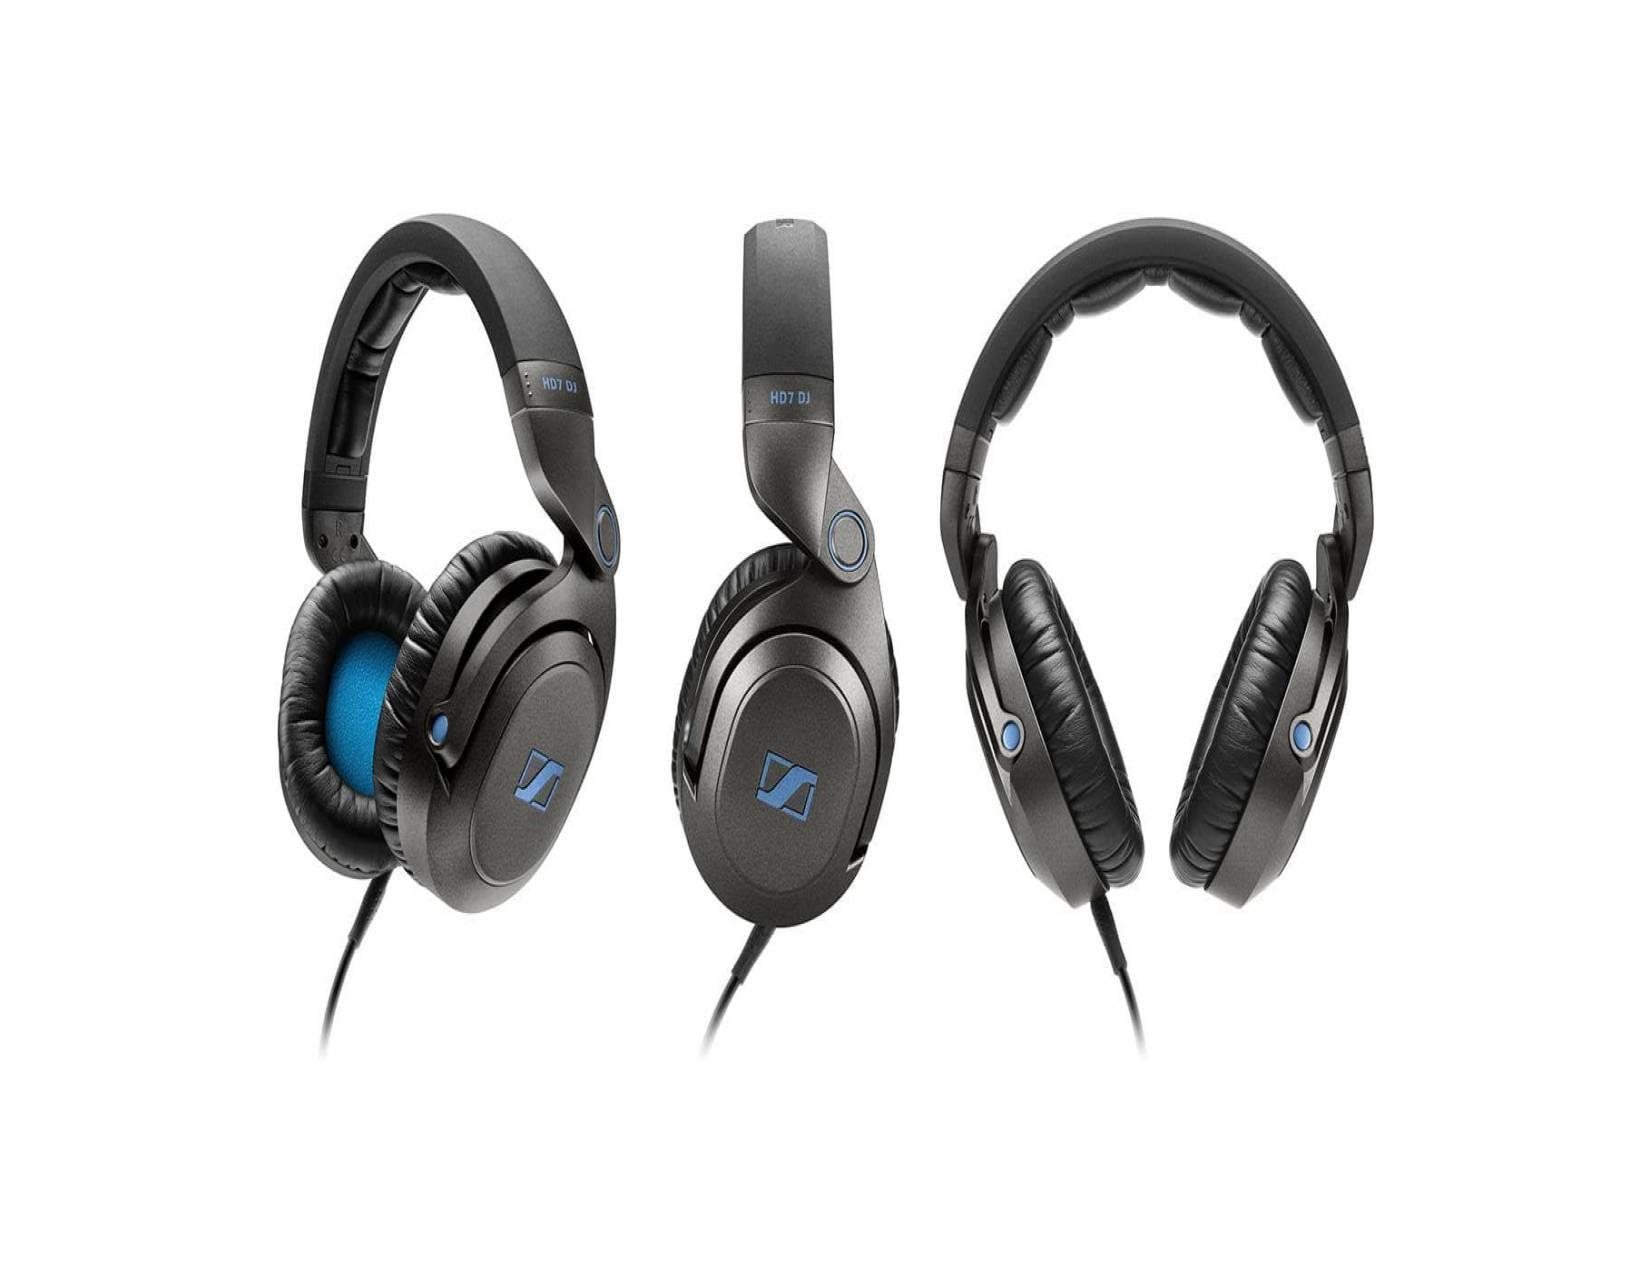 Sennheiser Hd 7 Dj Headphones Hitam Daftar Harga Terlengkap Indonesia Hd7 Closed Over Ear Headphone